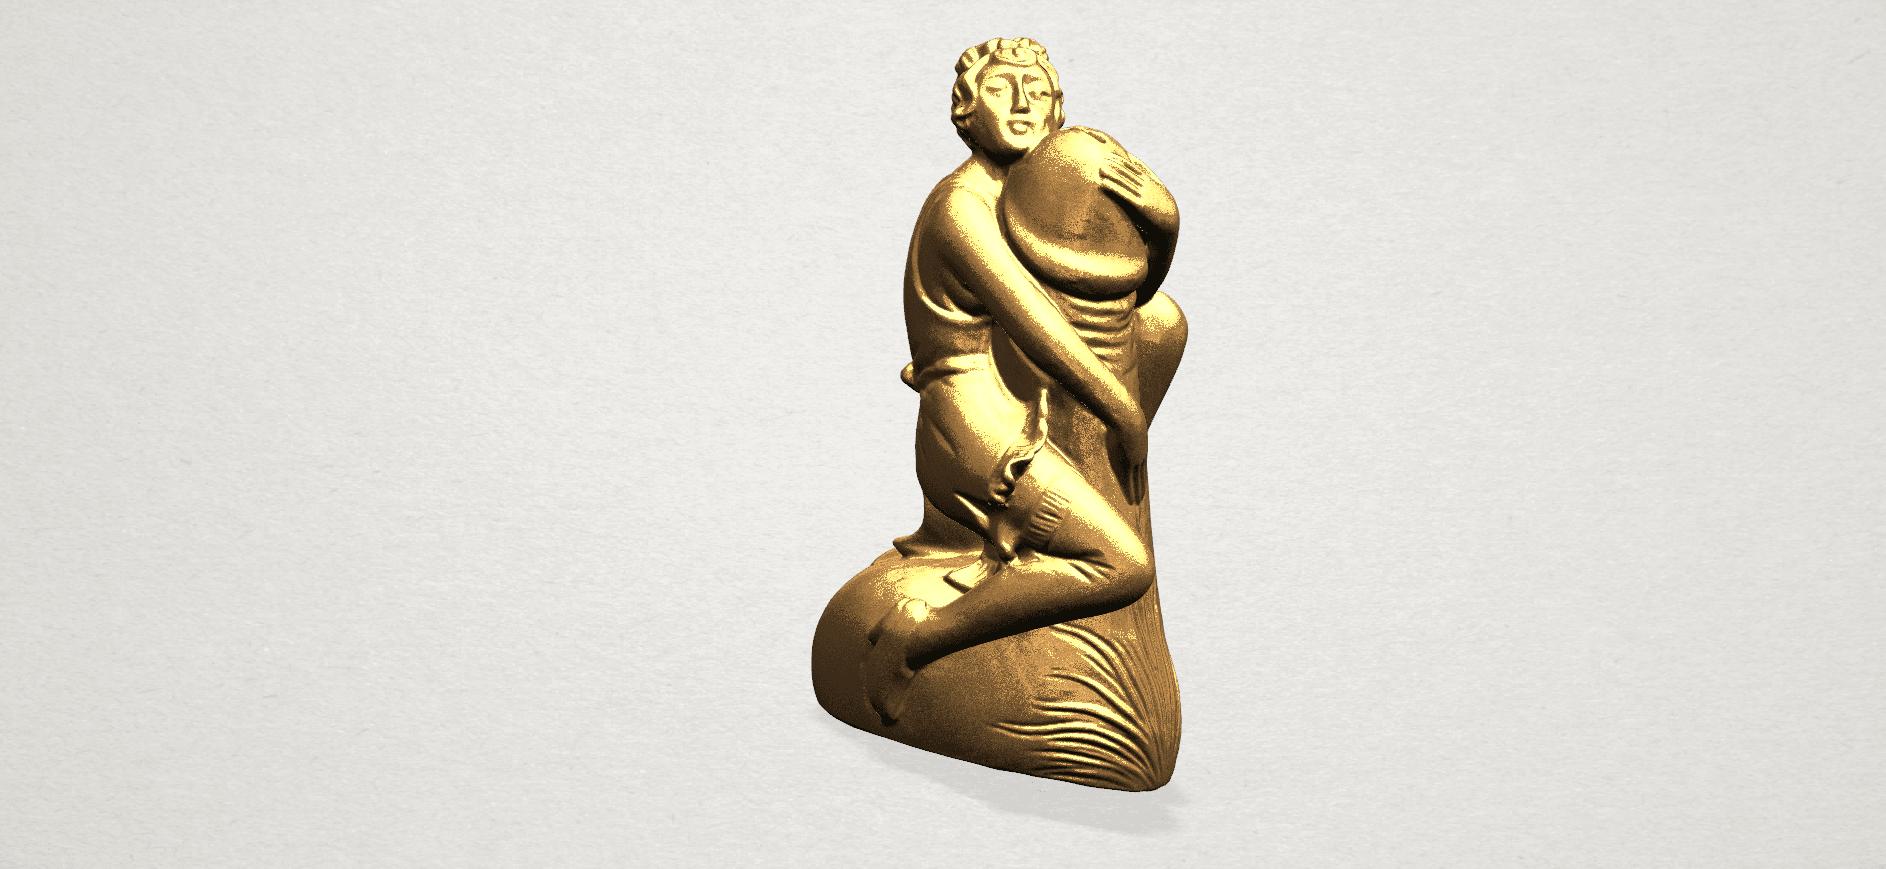 Alice hugging Dick - C05.png Download free STL file Alice hugging Dick • 3D printer design, GeorgesNikkei